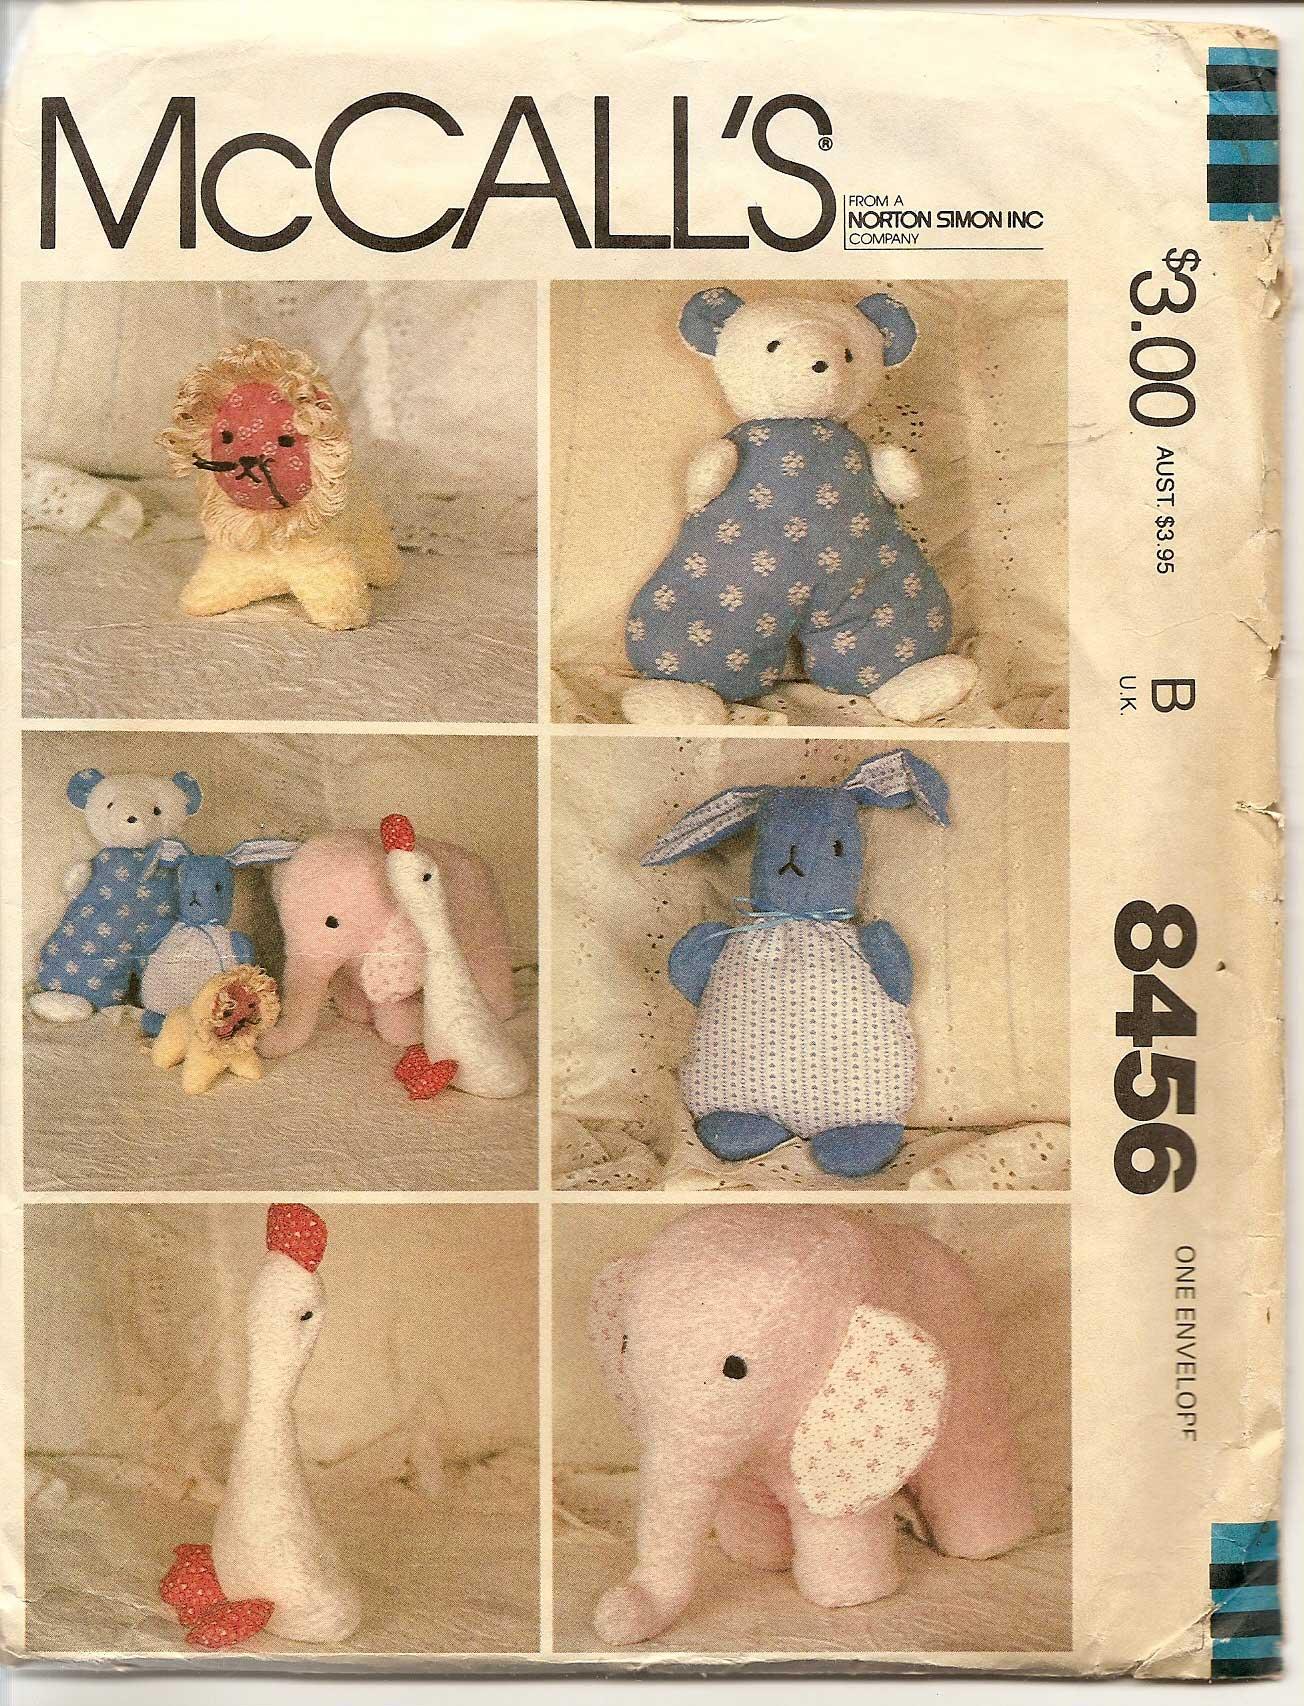 McCall's 8456